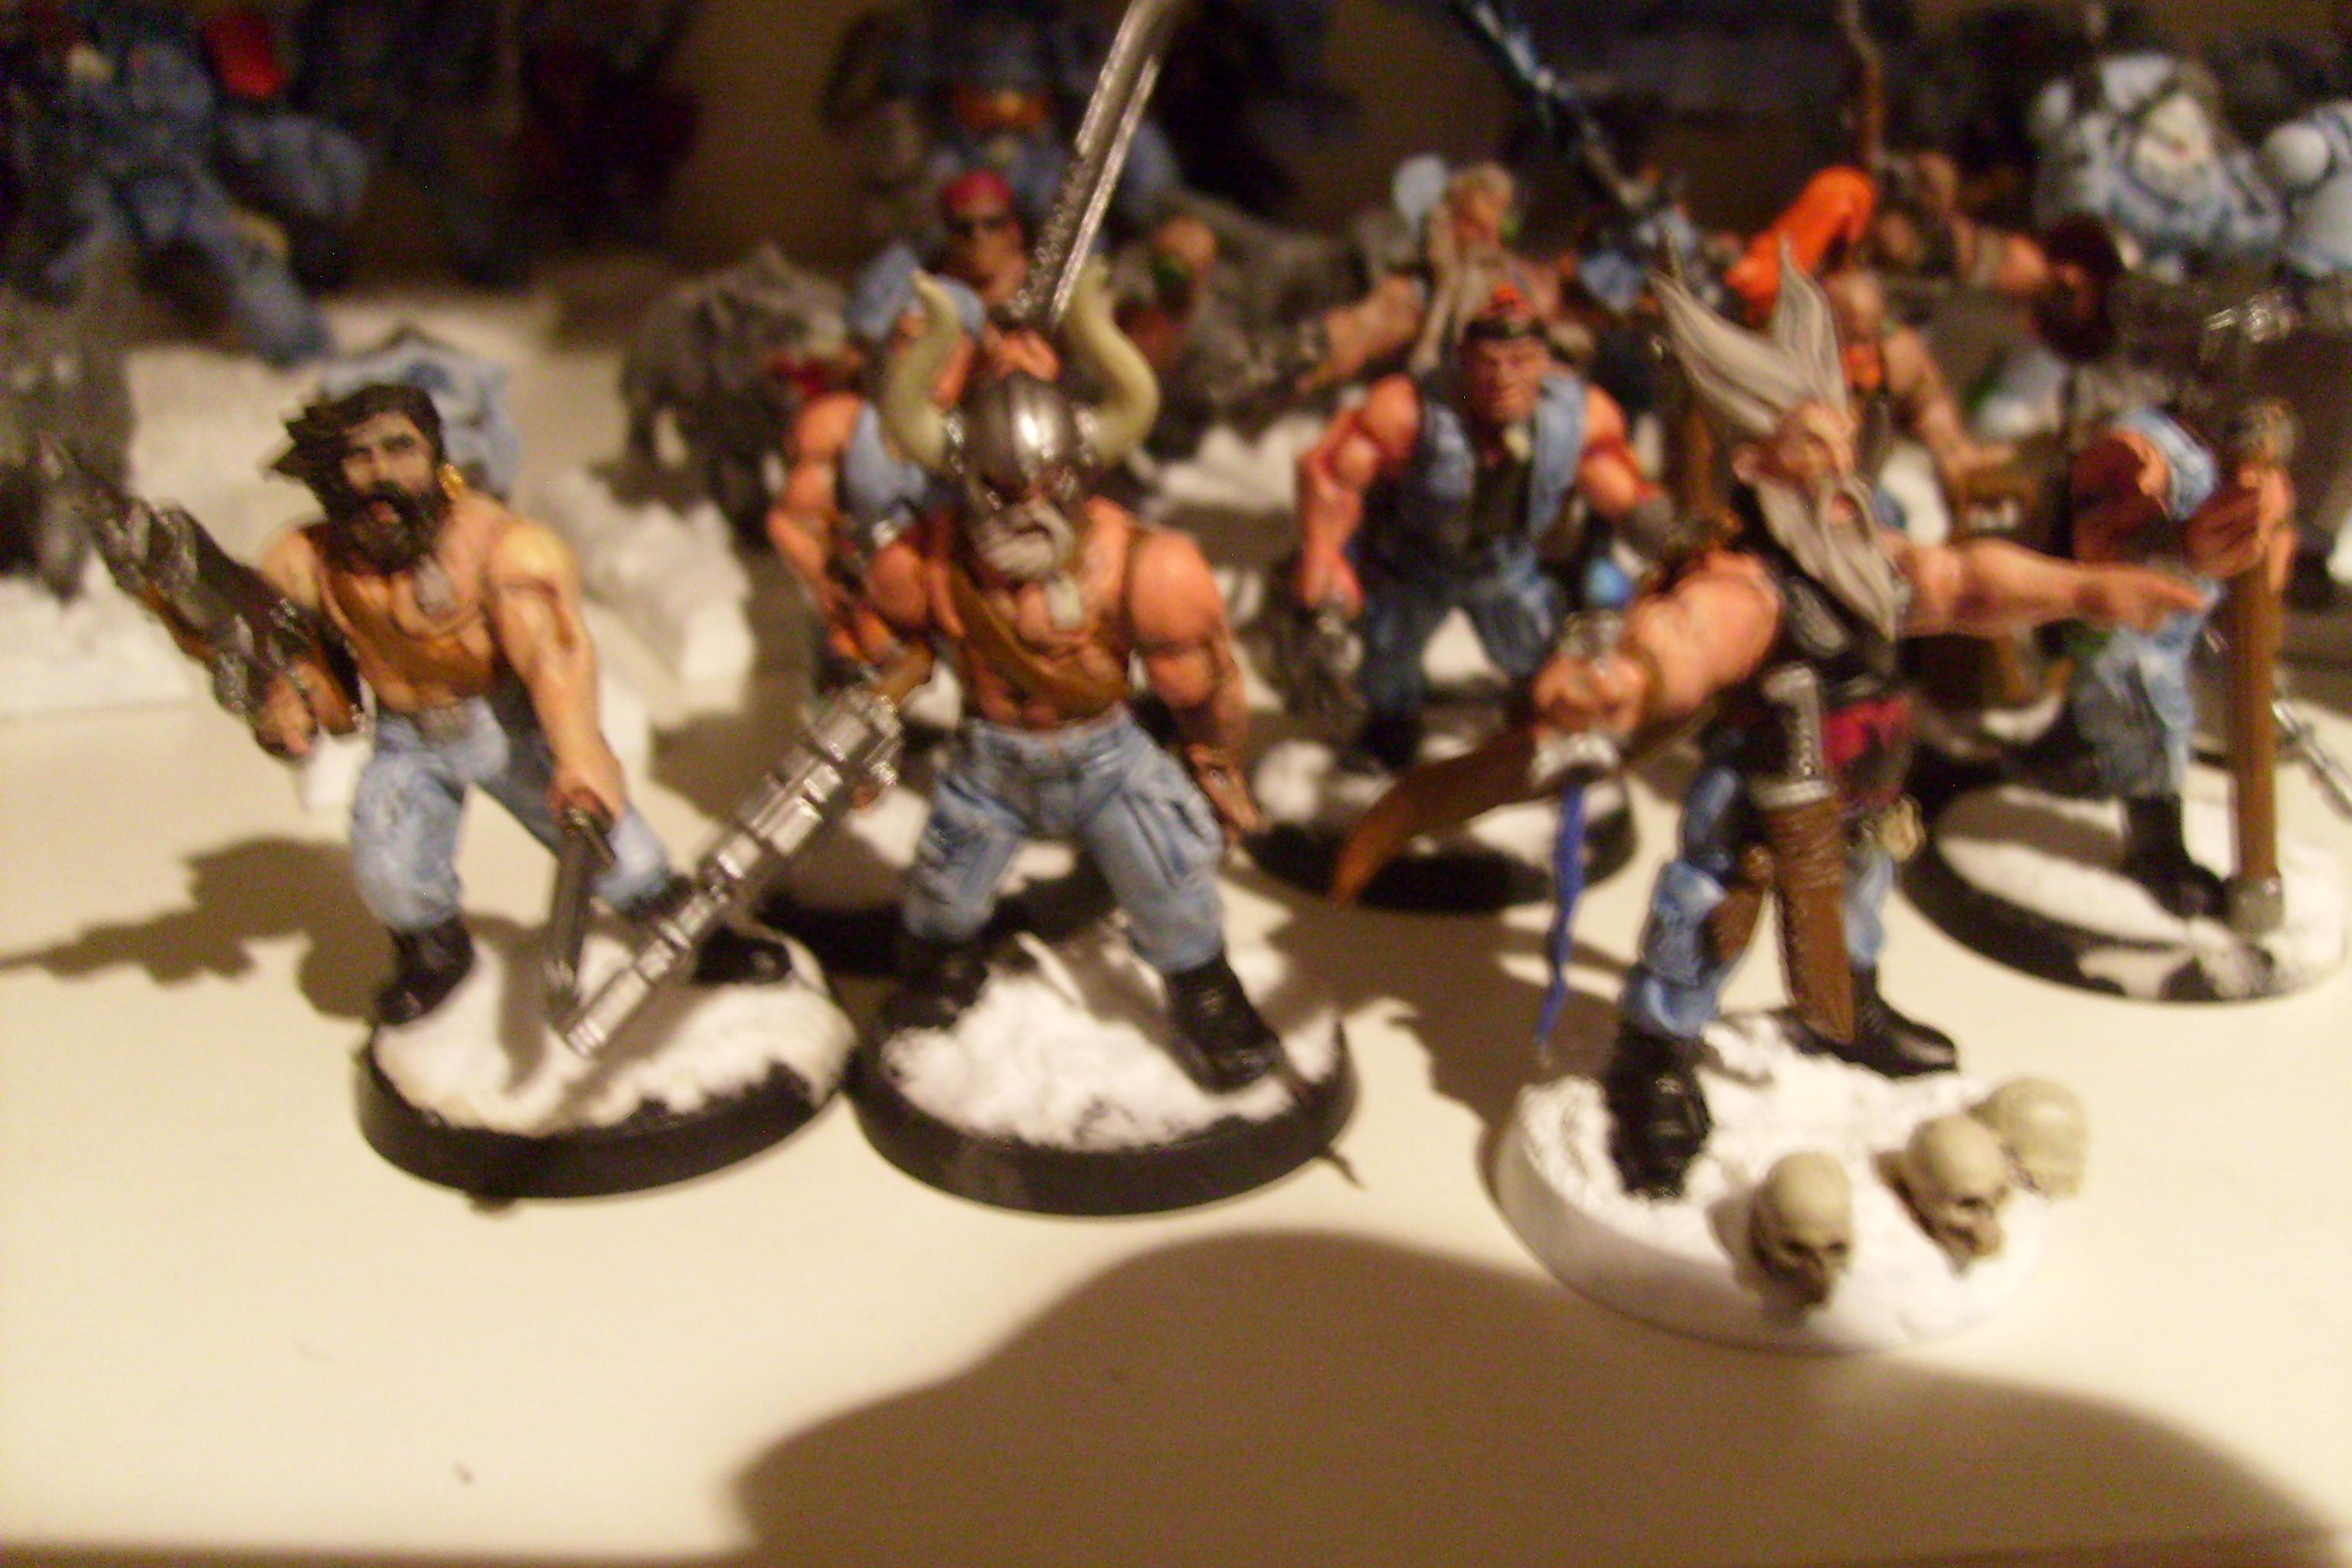 Imperial Guard, Spacewolves Fenrisian, Wolves